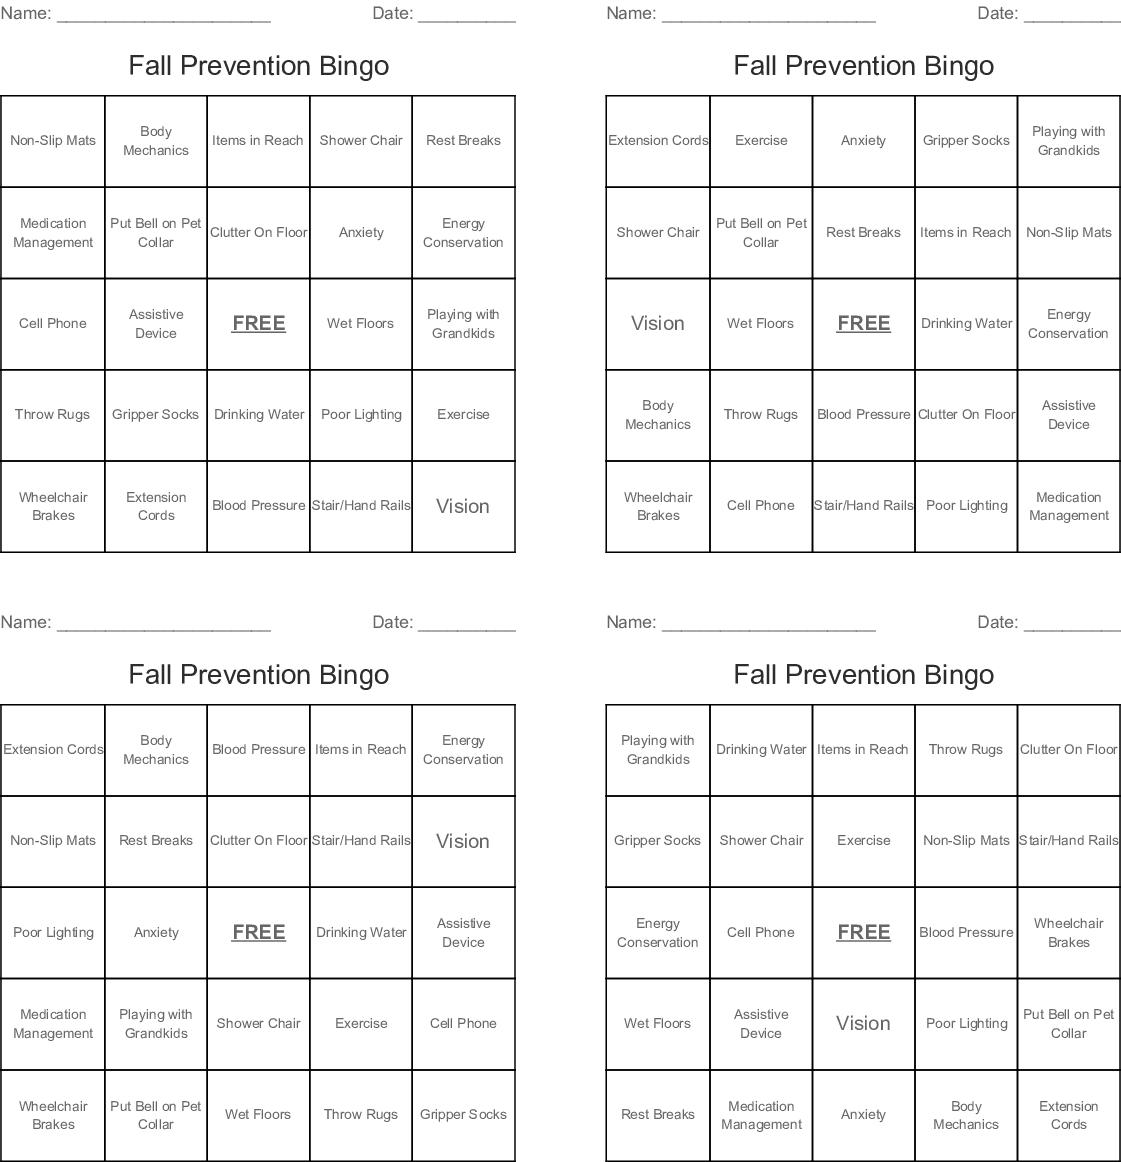 Fall Prevention Bingo Cards - Wordmint